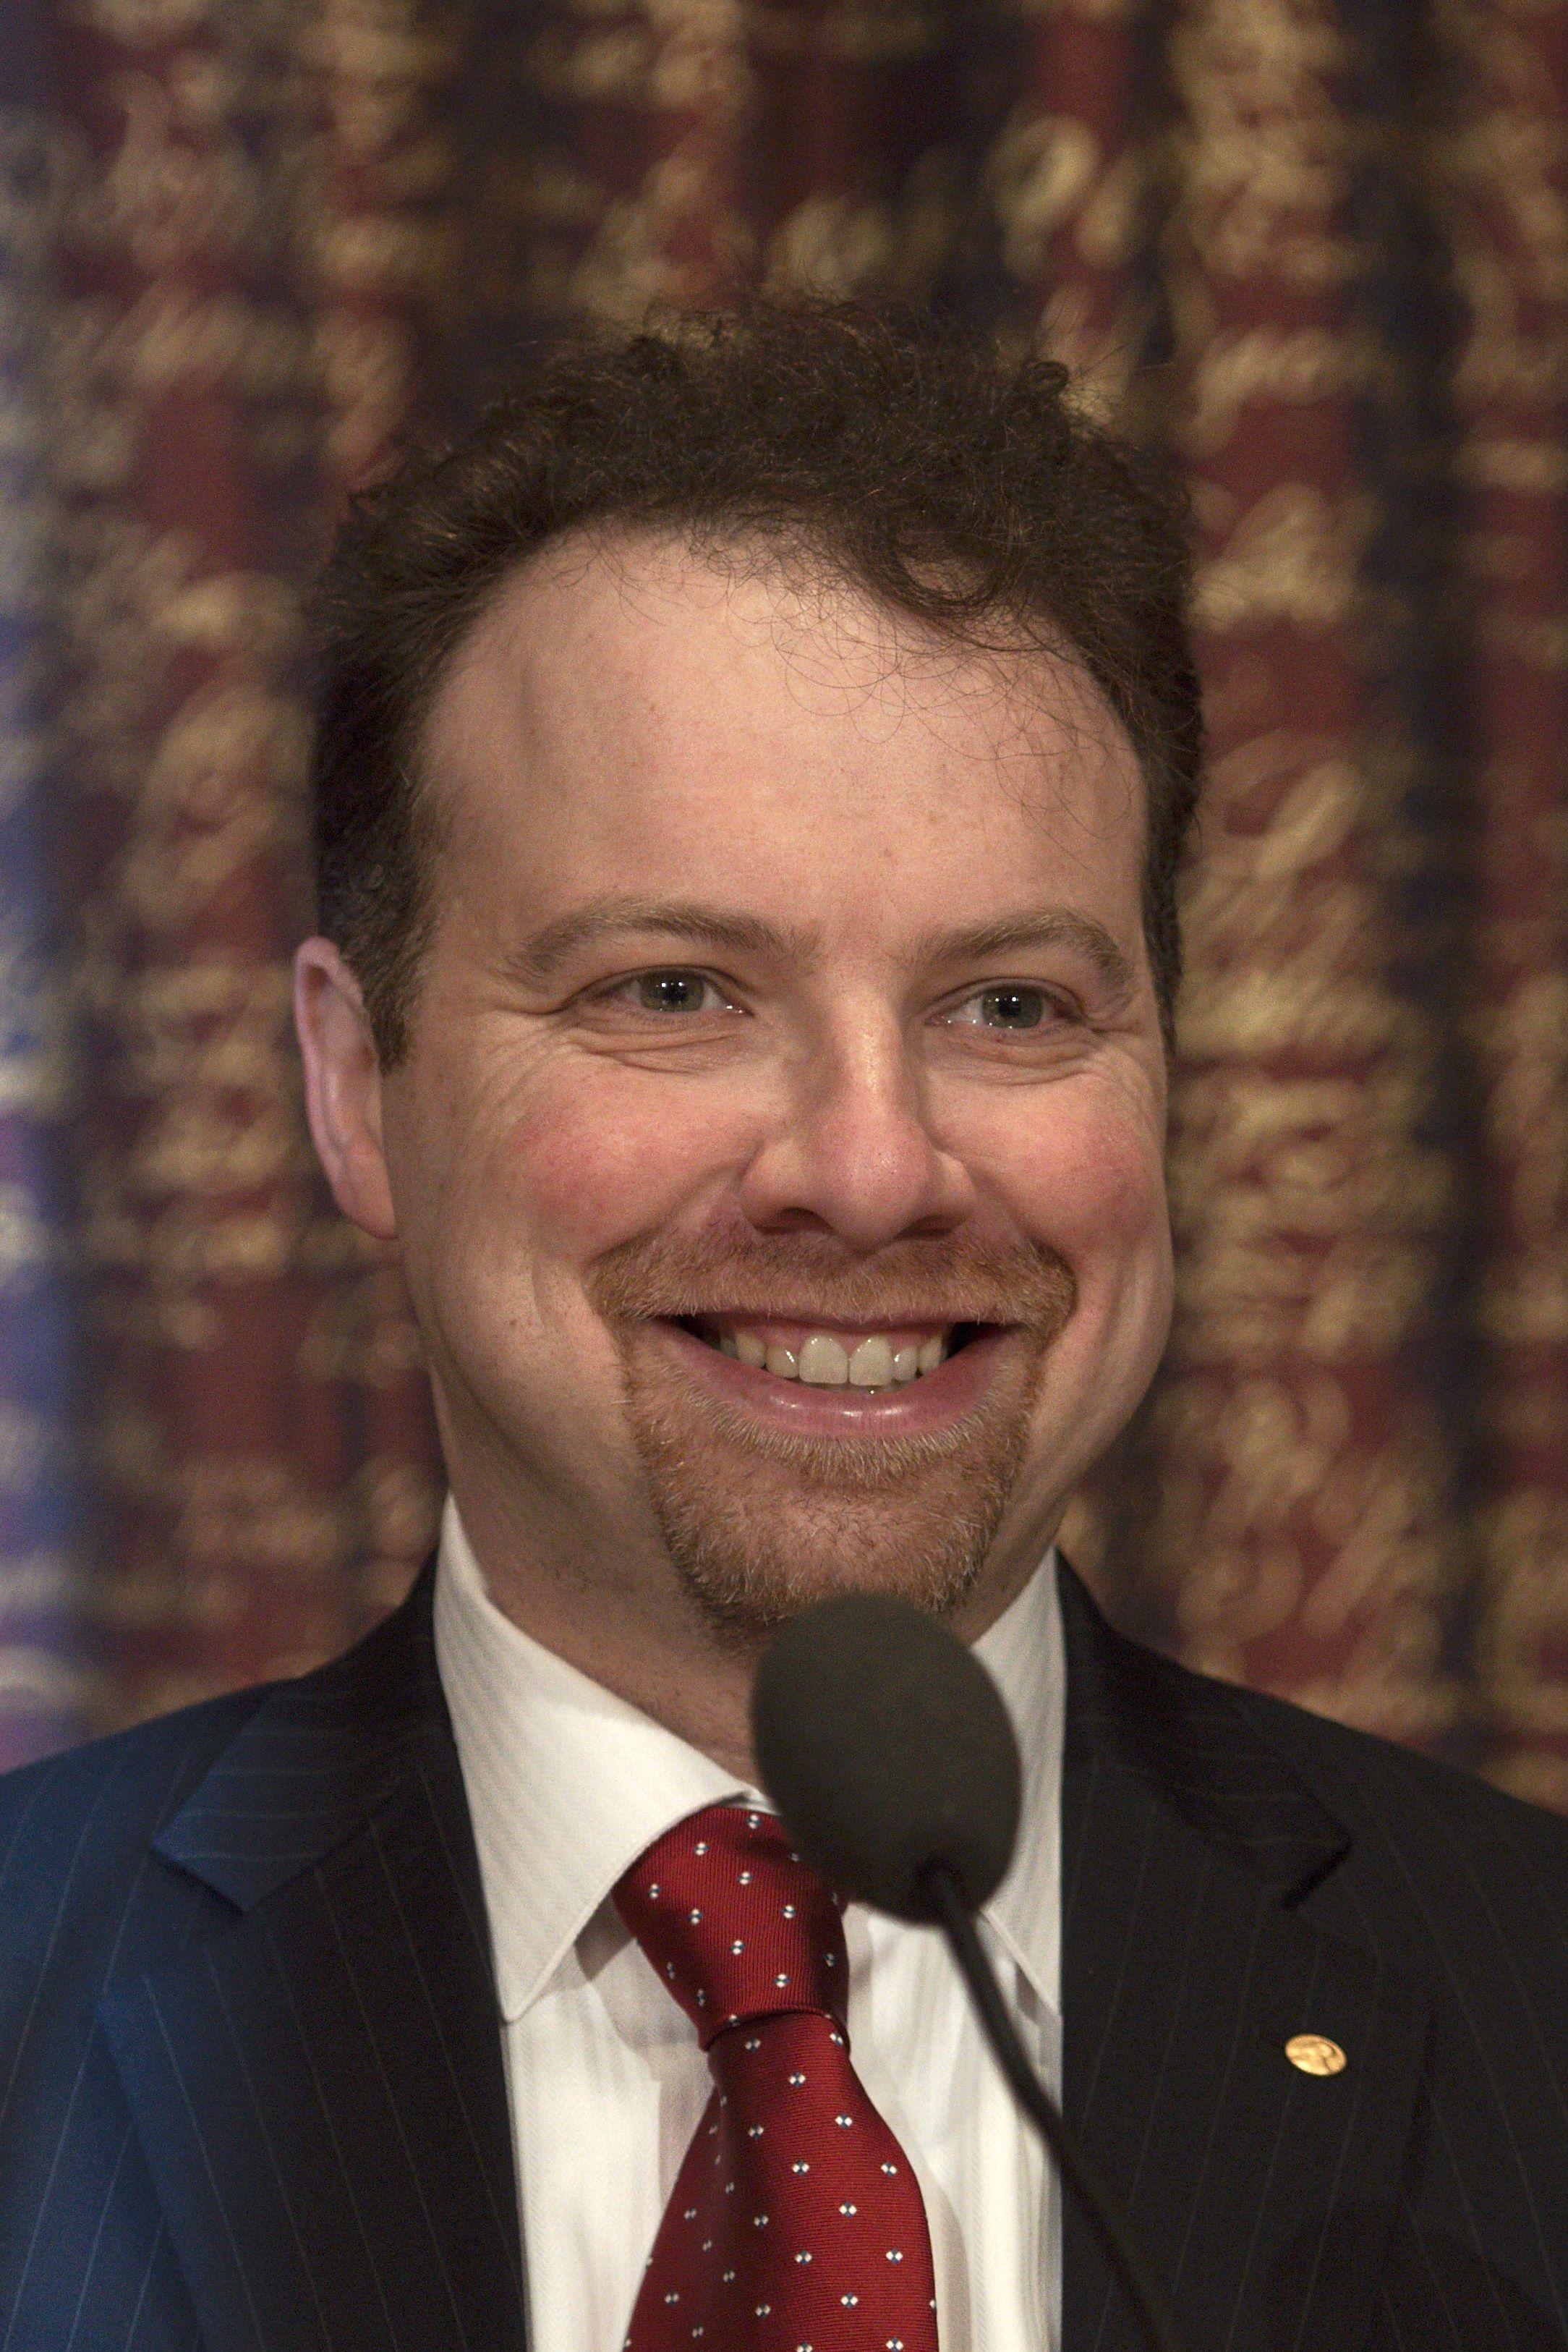 image of Adam Riess